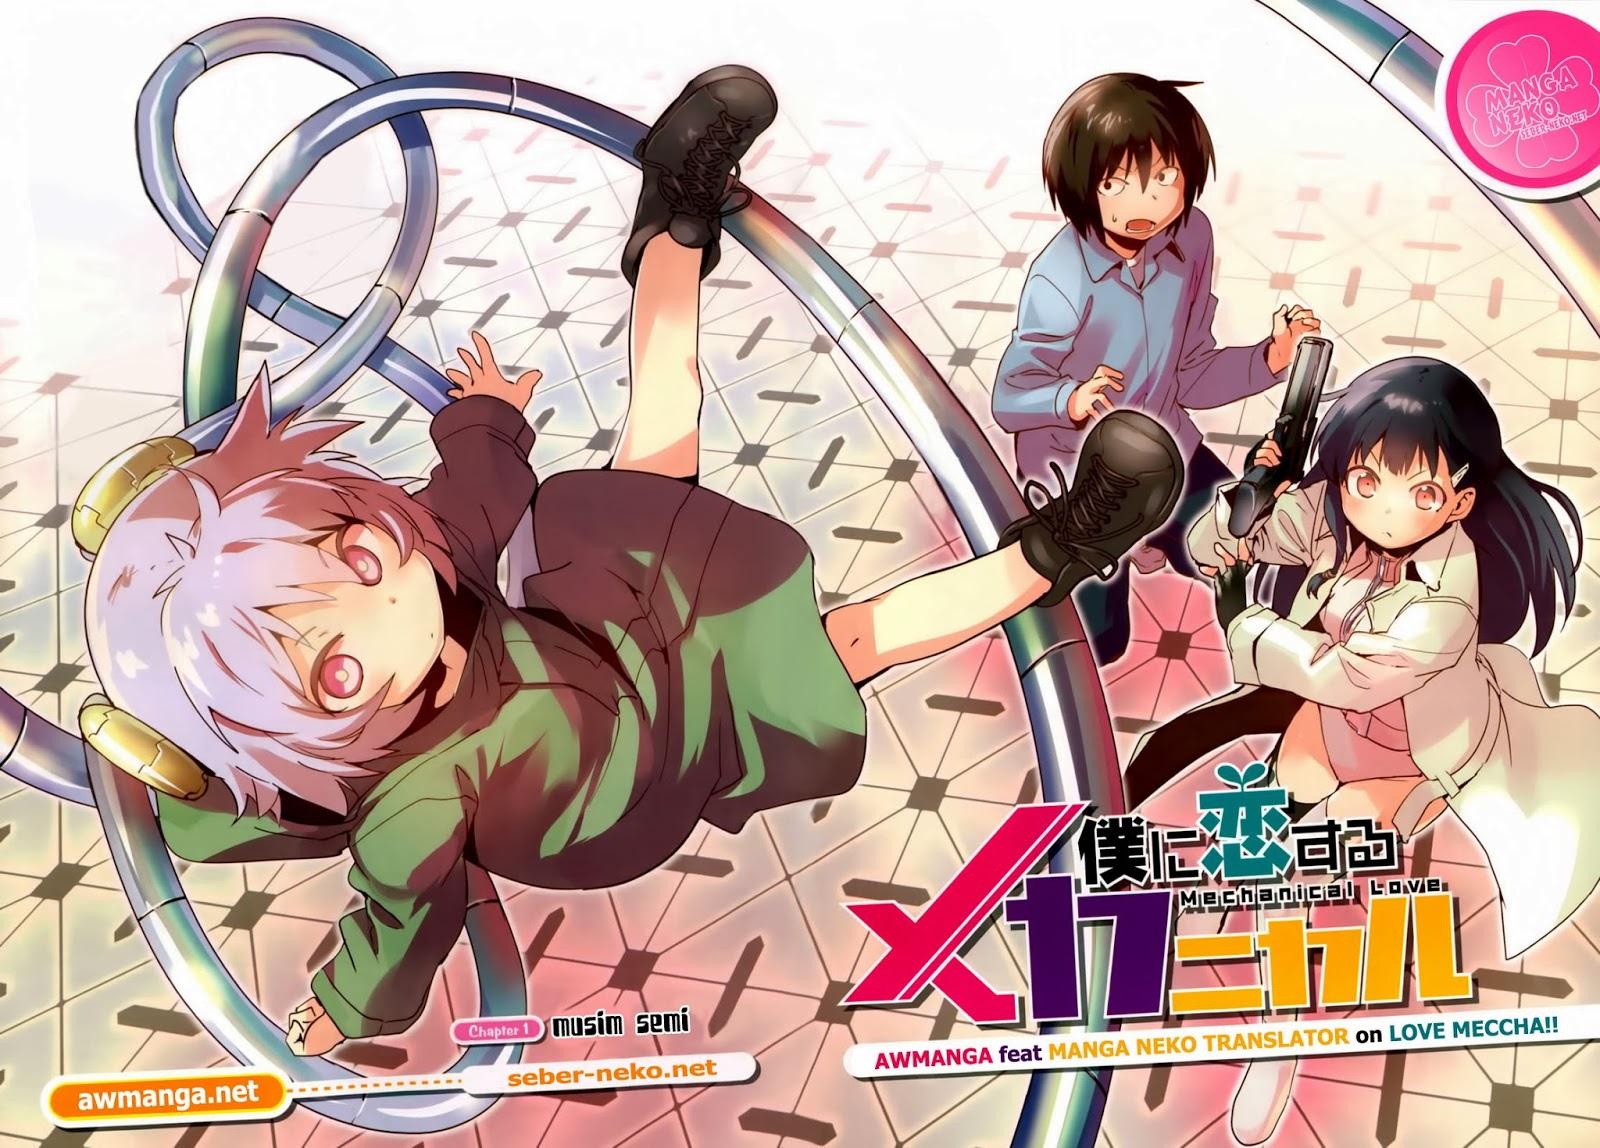 Komik mecha love 001 - musim semi 2 Indonesia mecha love 001 - musim semi Terbaru 1 Baca Manga Komik Indonesia 